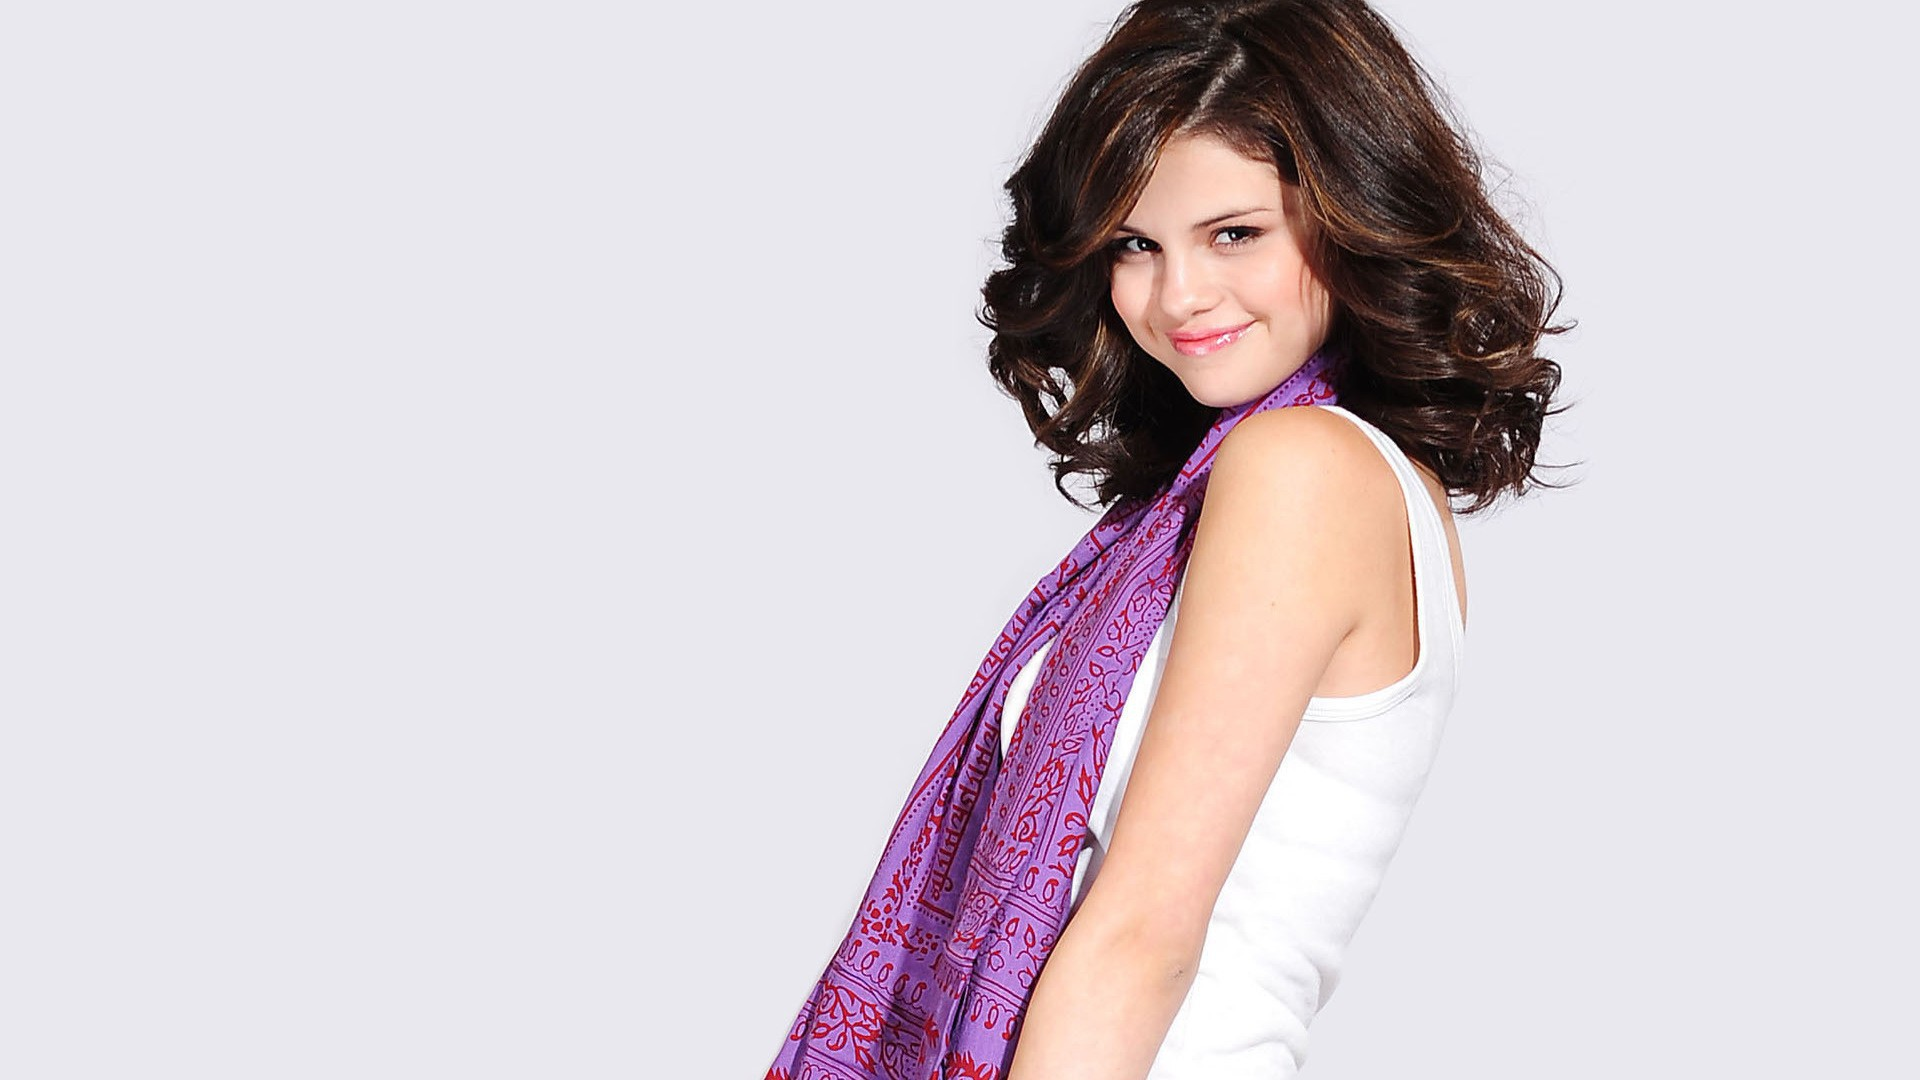 Selena Gomez Deskto